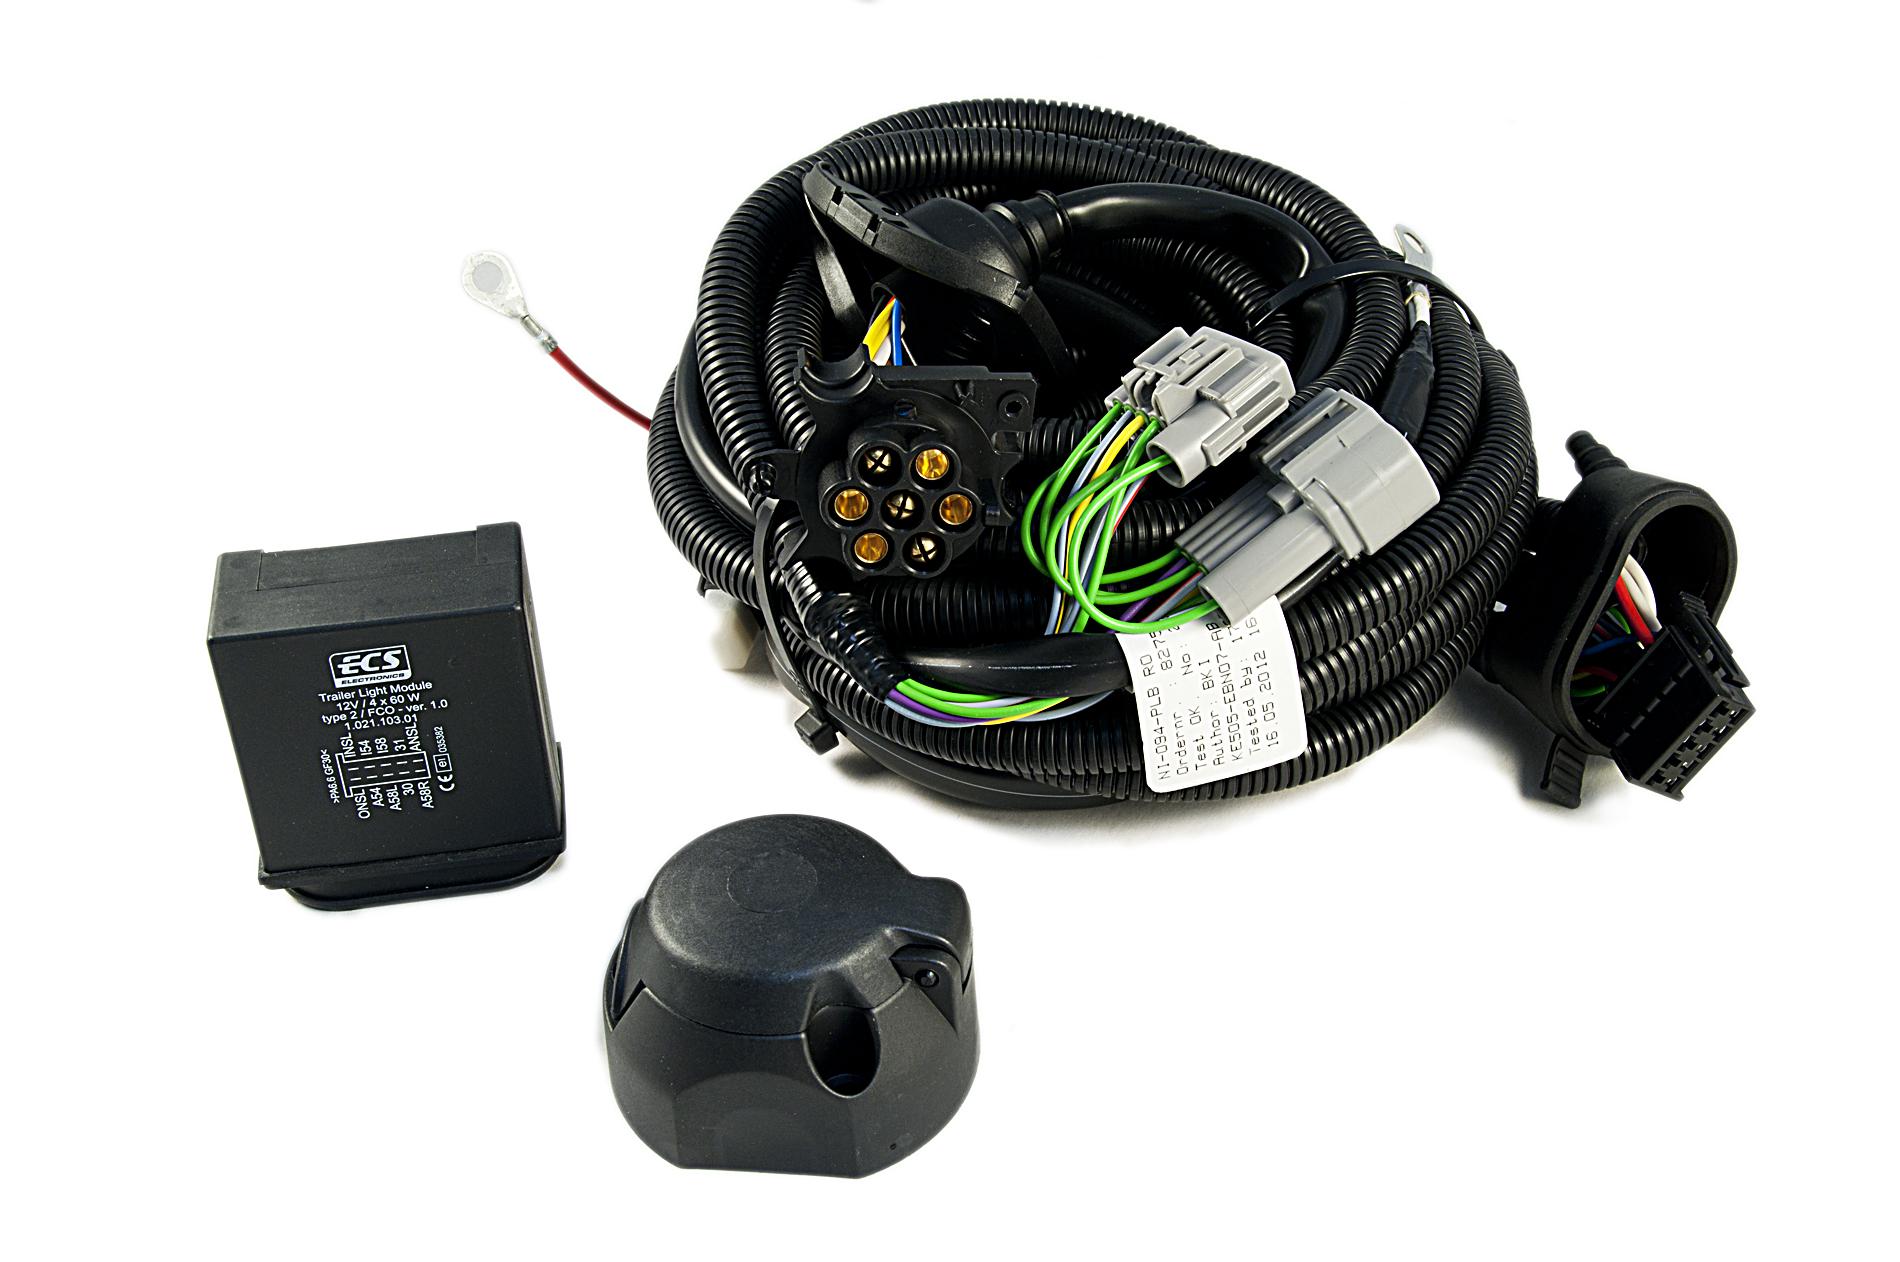 Nissan S15 Stereo Wiring Diagram Not Lossing Juke Radio Harness Ke Get Free Image About Car 2014 Al